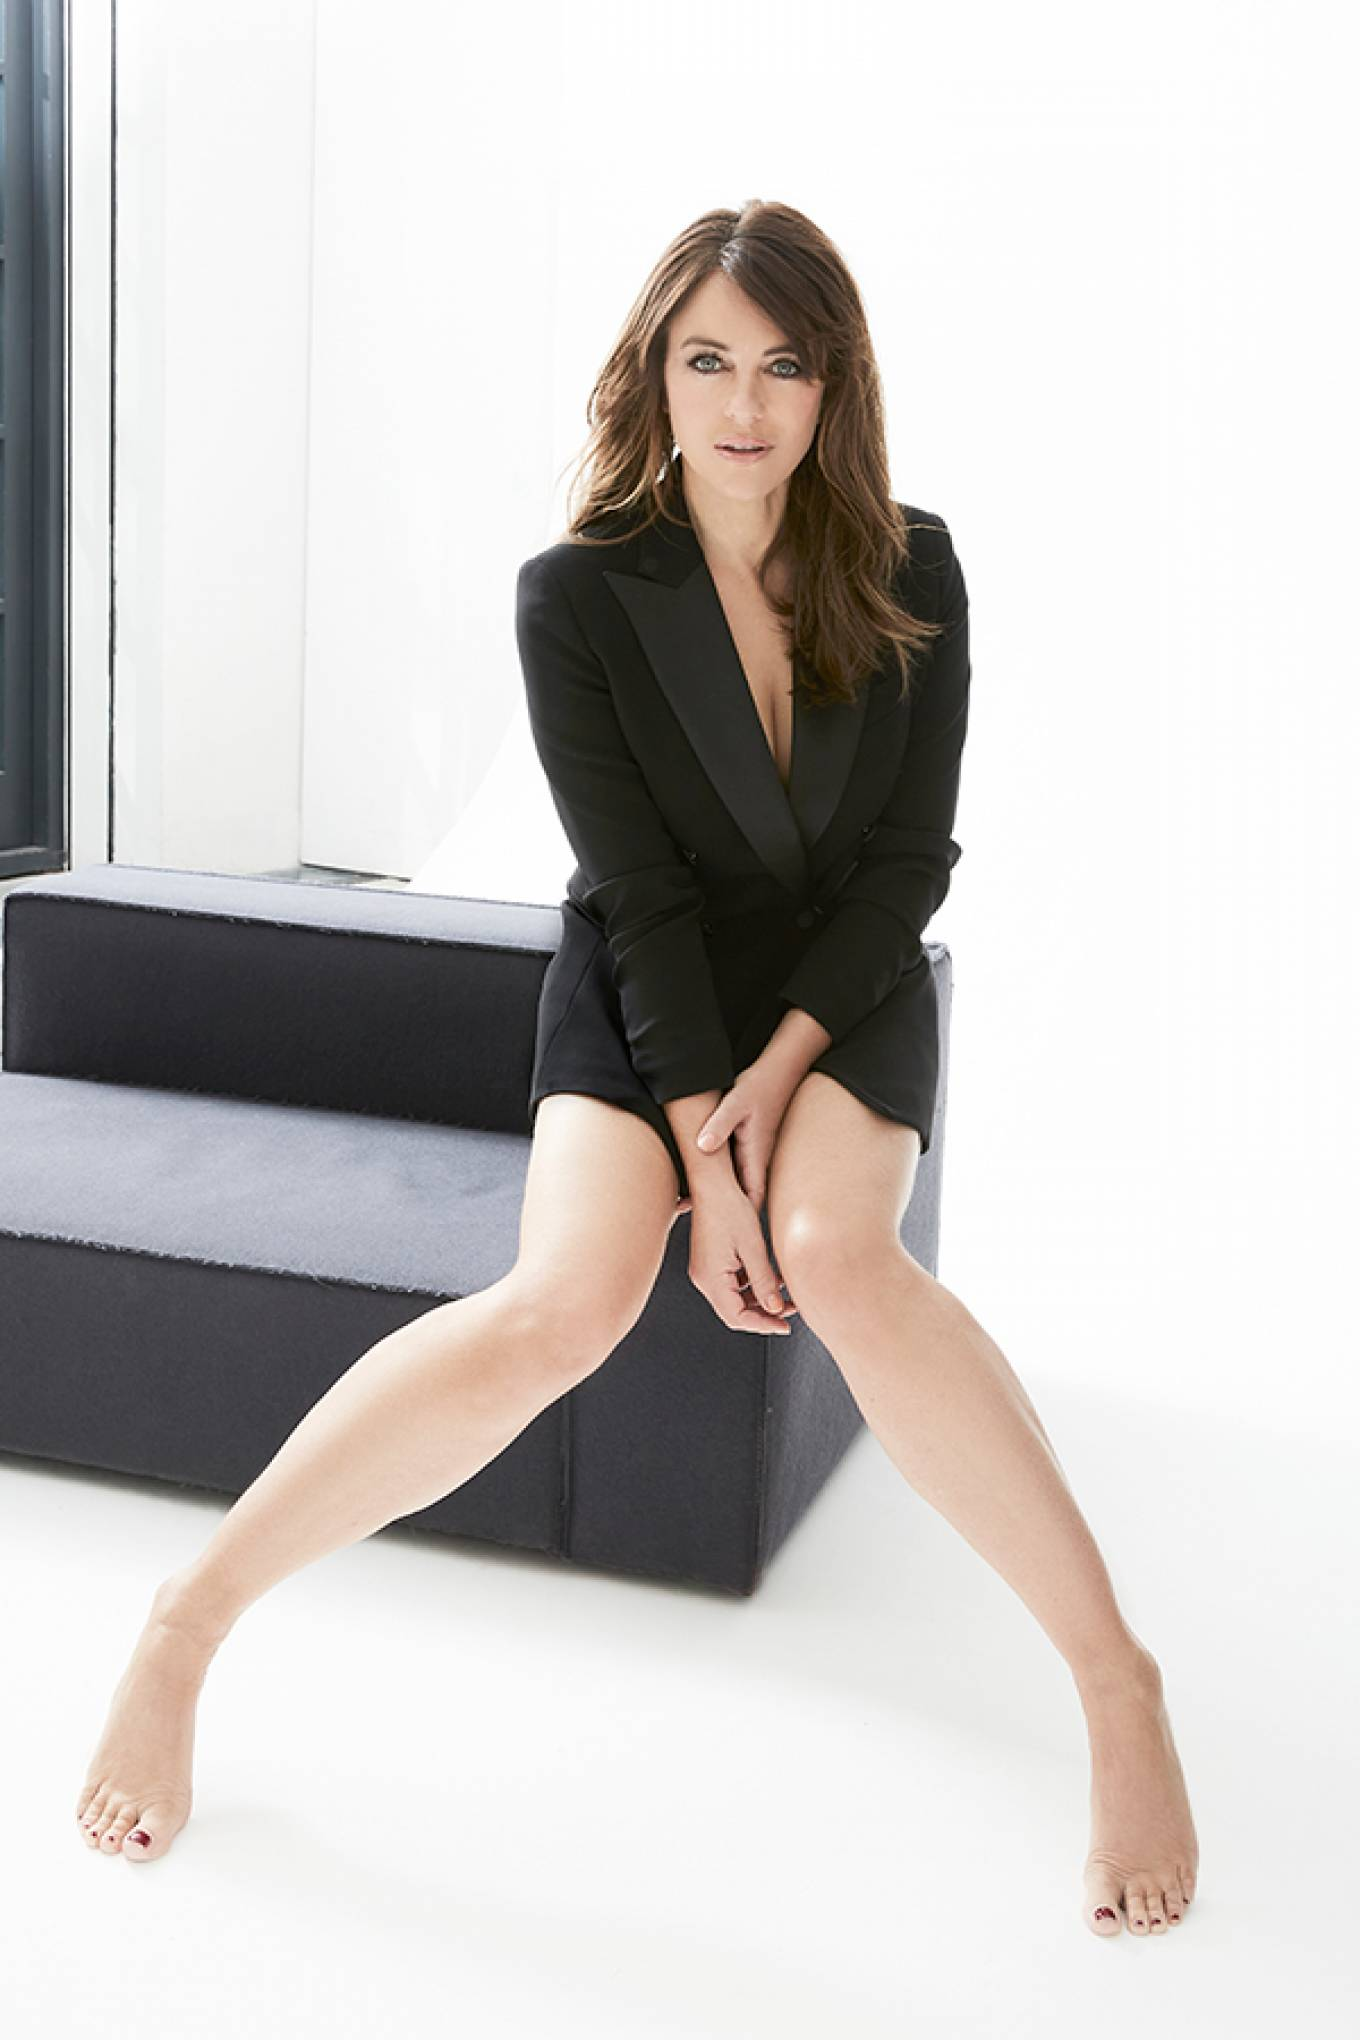 Elizabeth Hurley - Alan Gelati for YOU Magazine